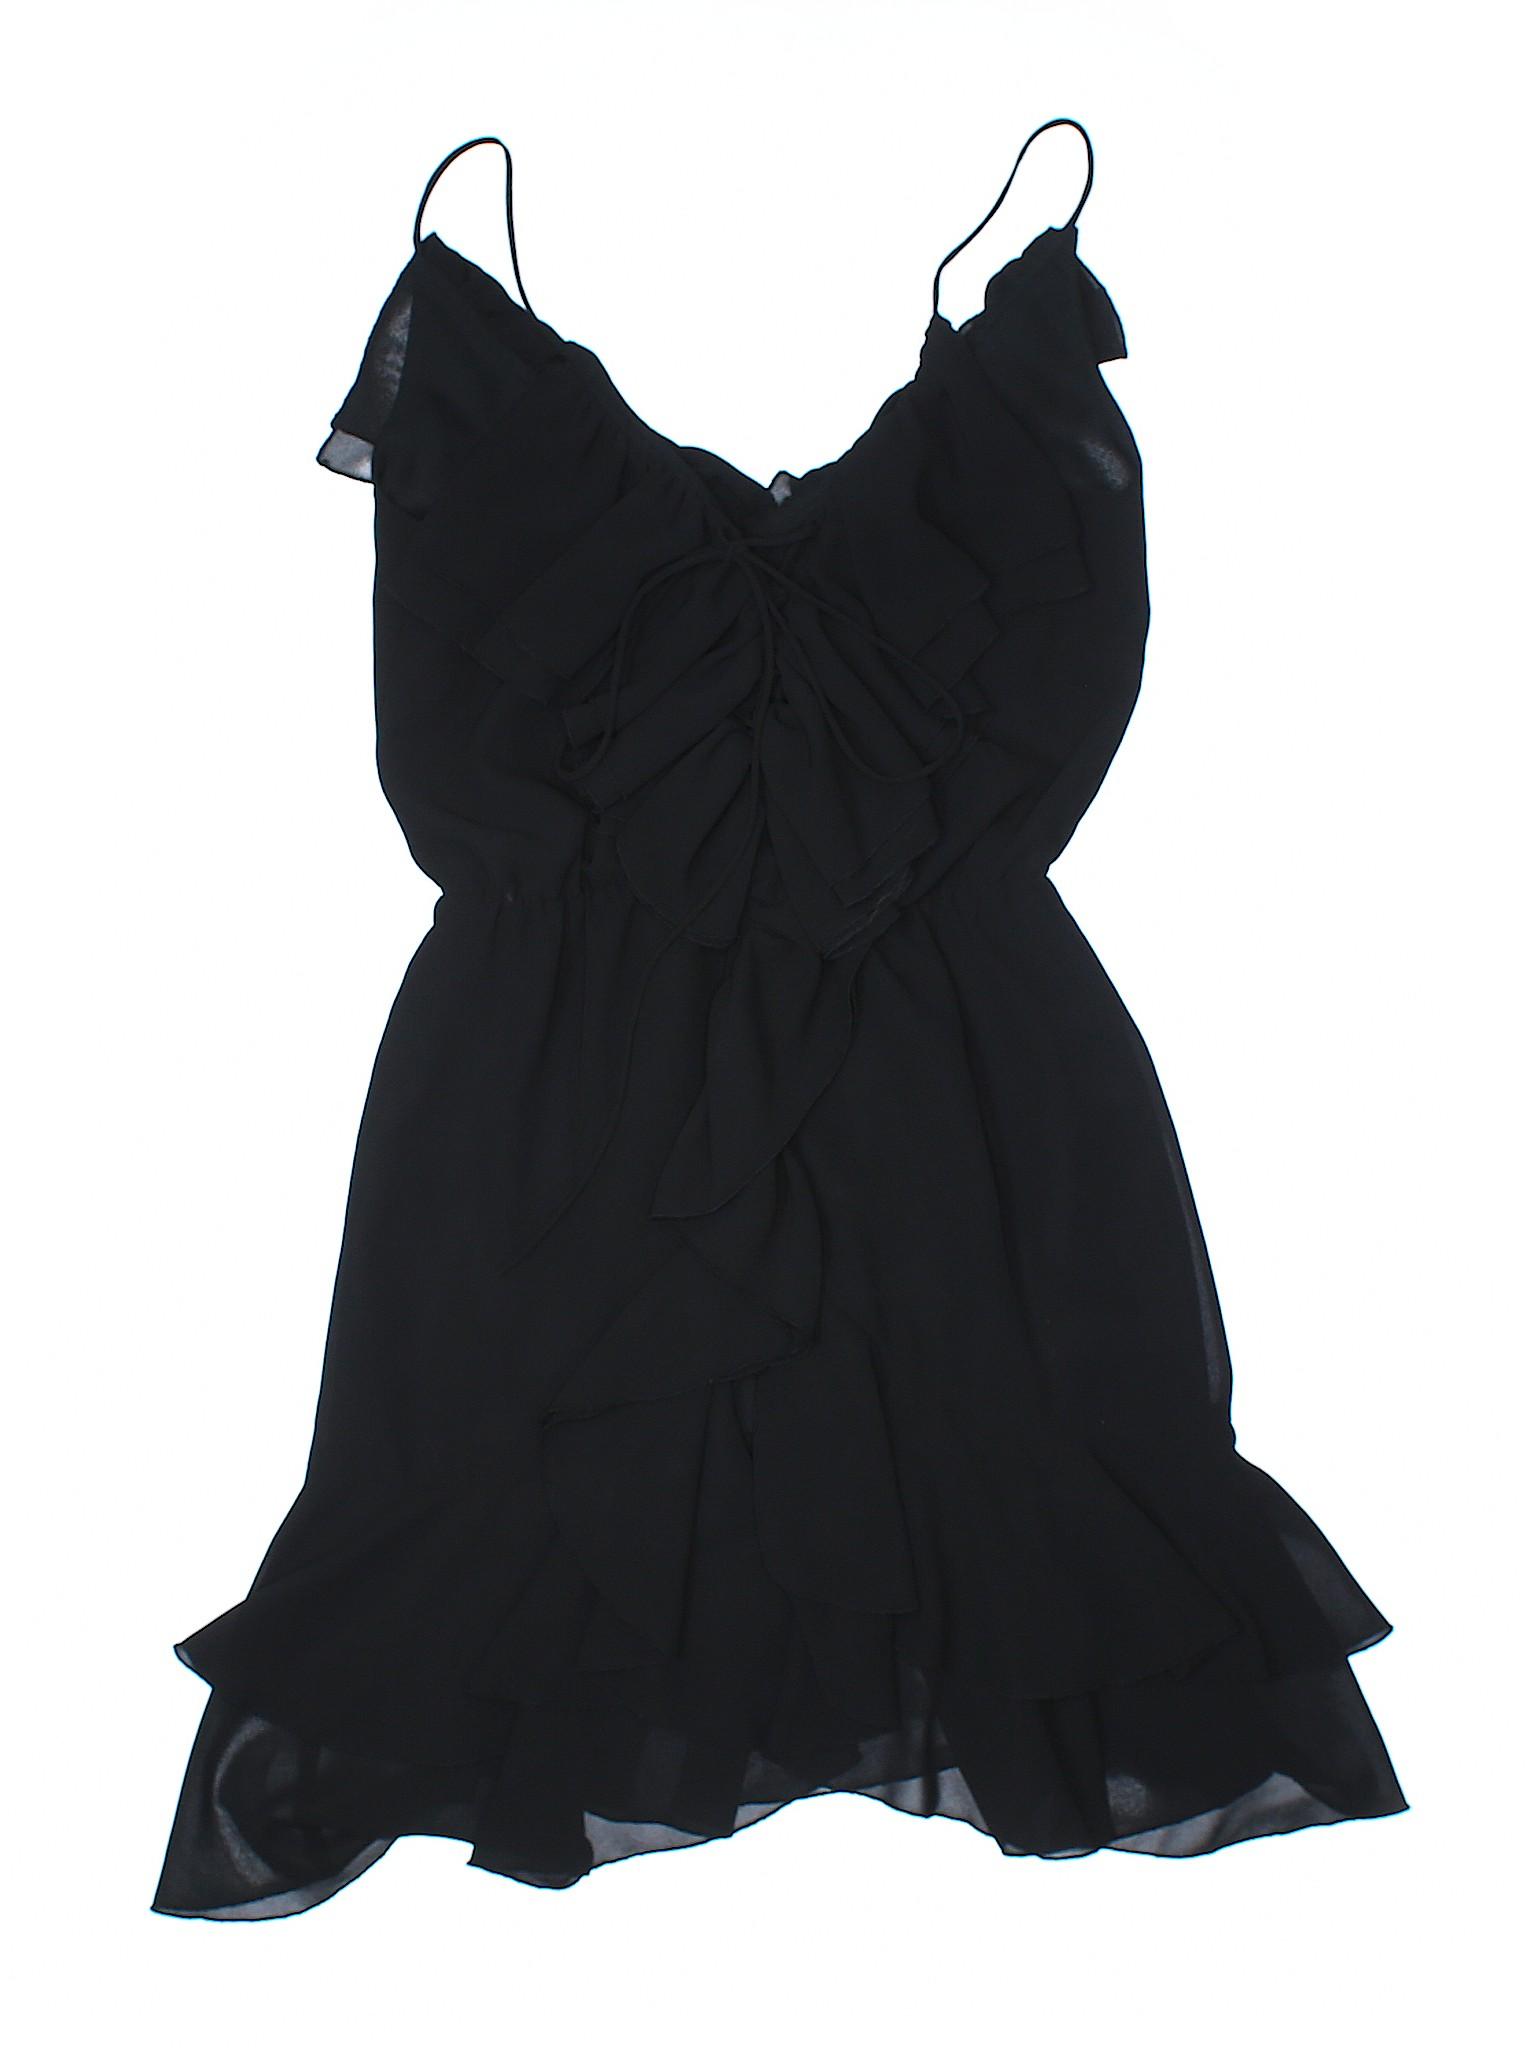 H winter amp;M Casual Boutique Dress AHga0xq